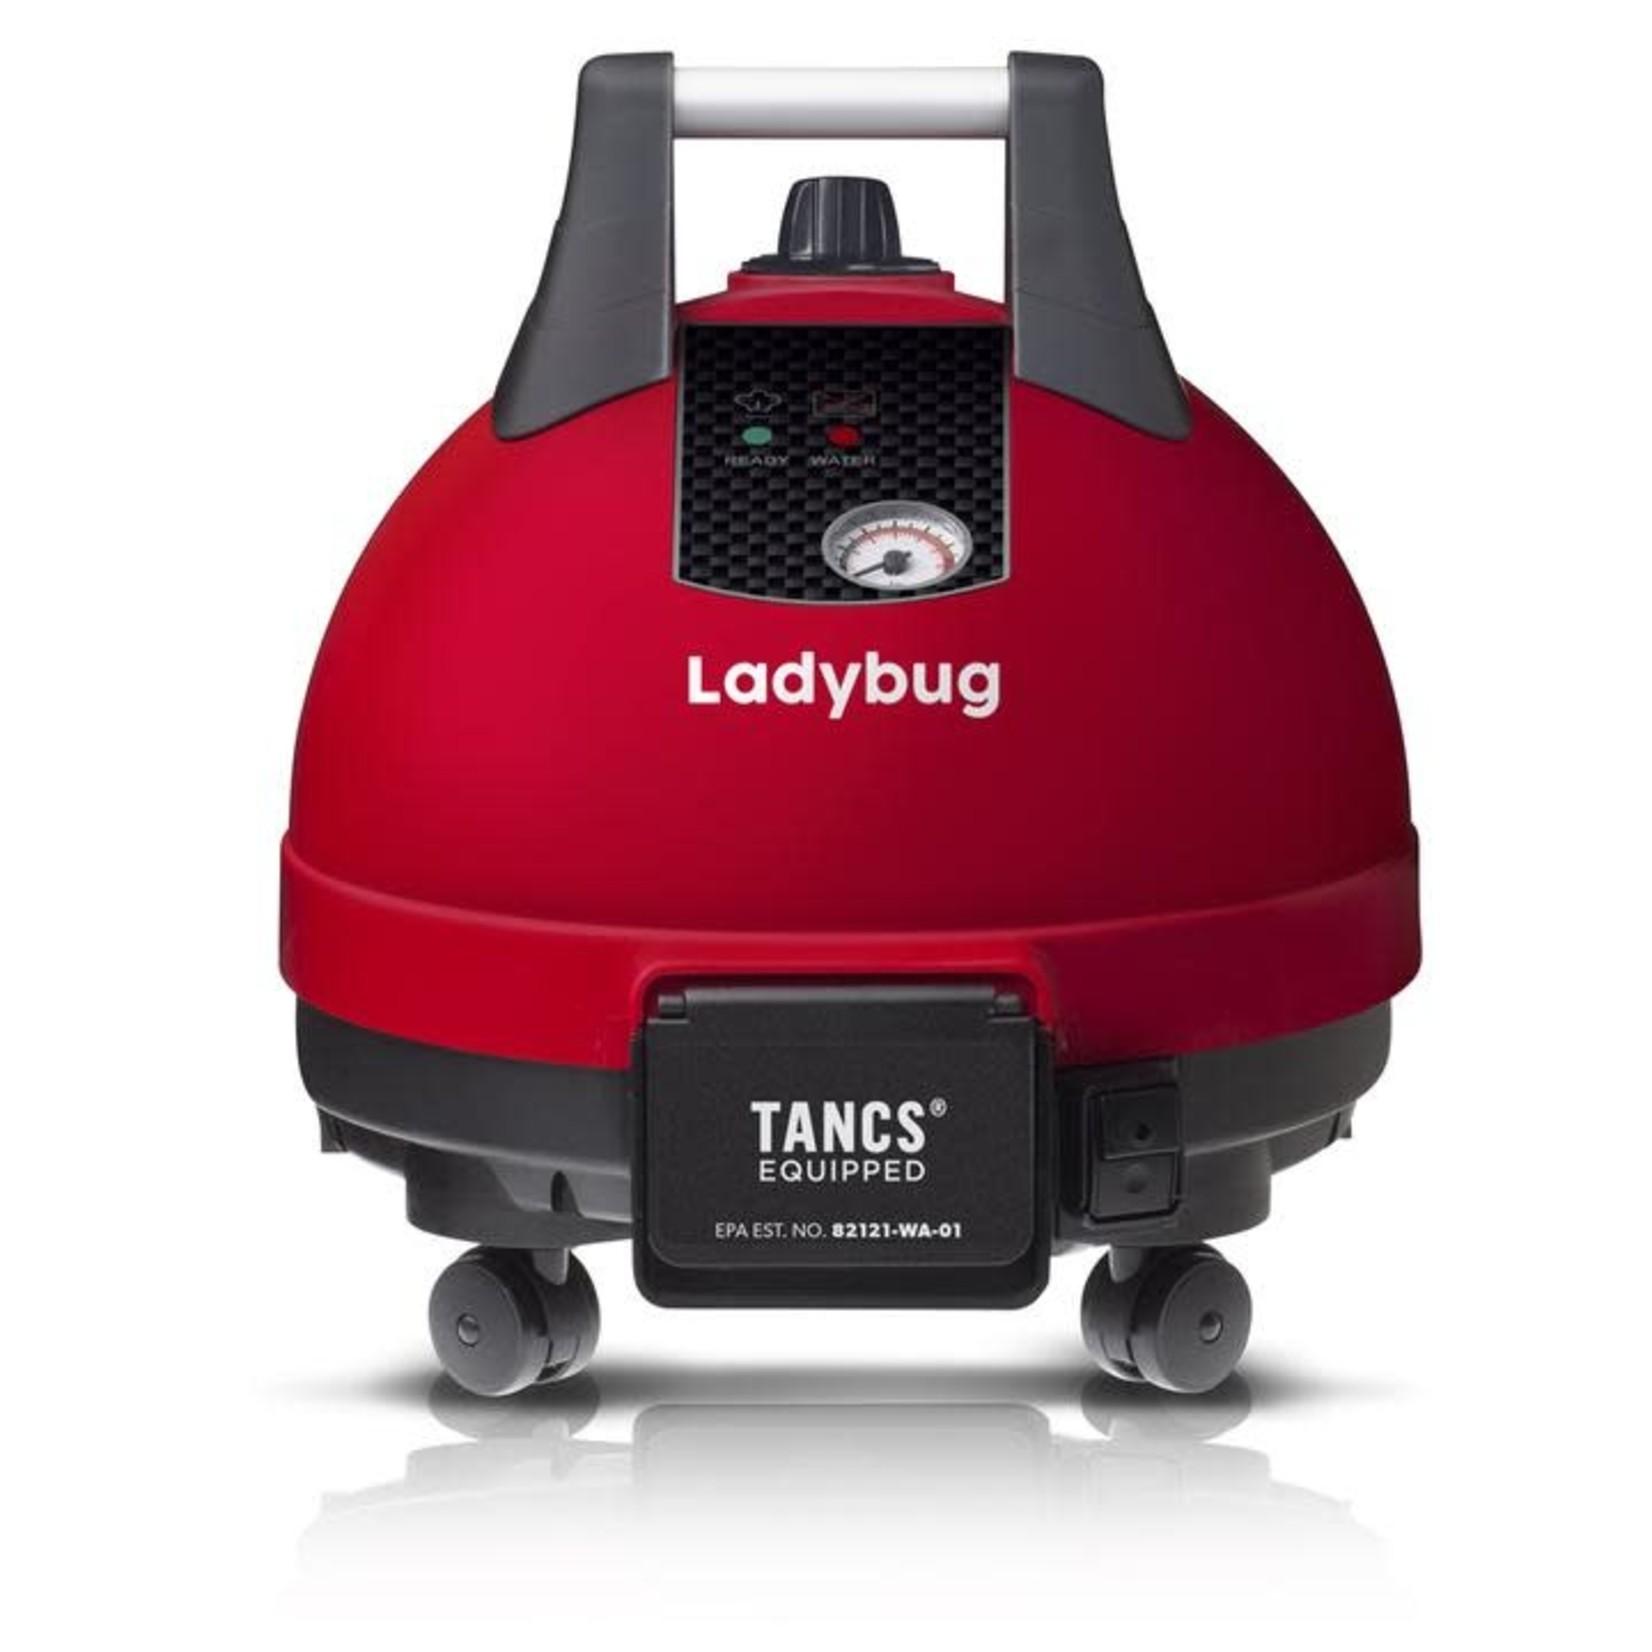 Advanced Vapor Advanced Vapor Ladybug Steamer - 2300